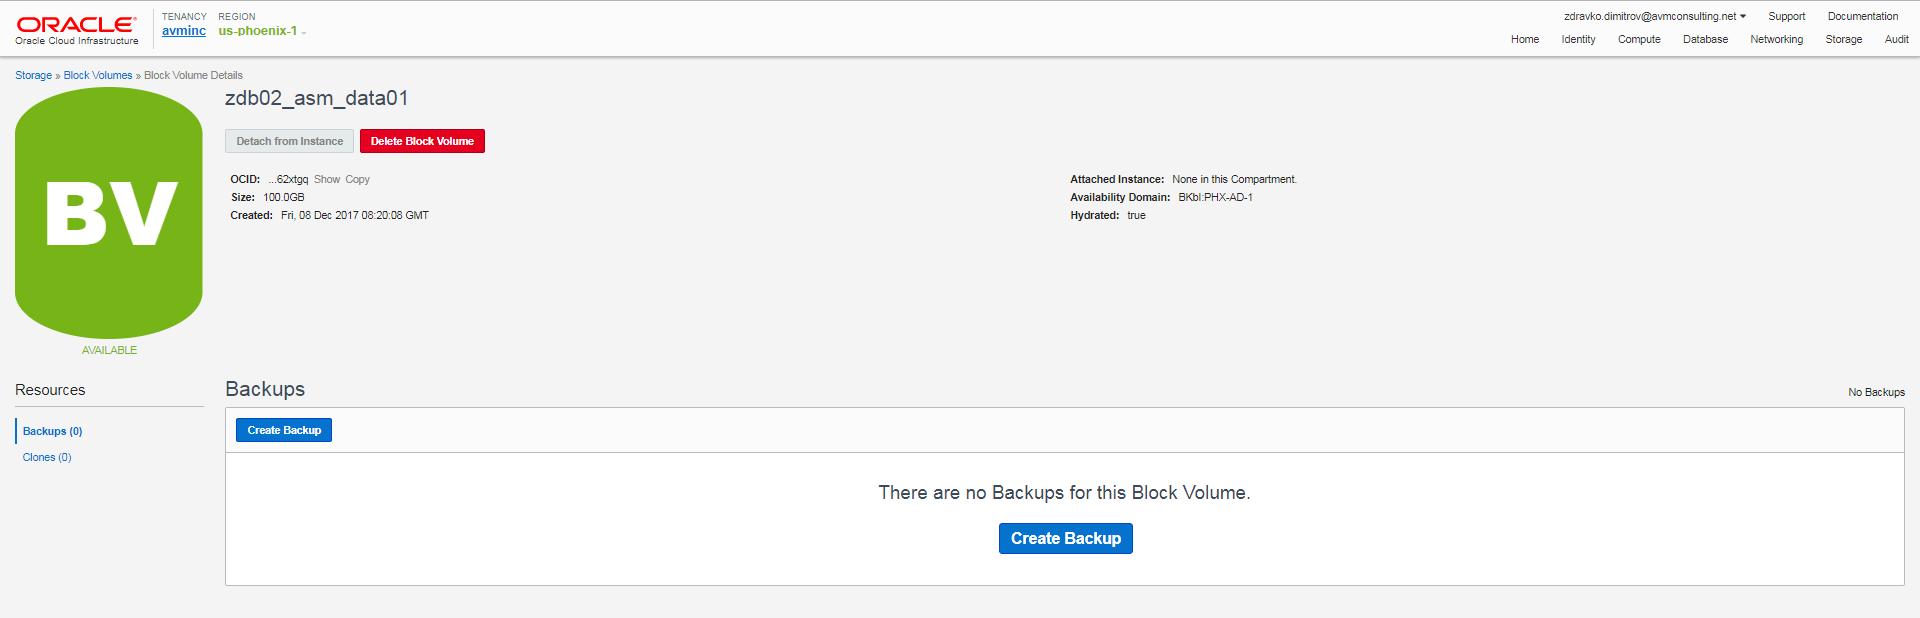 Block Volume Details Available